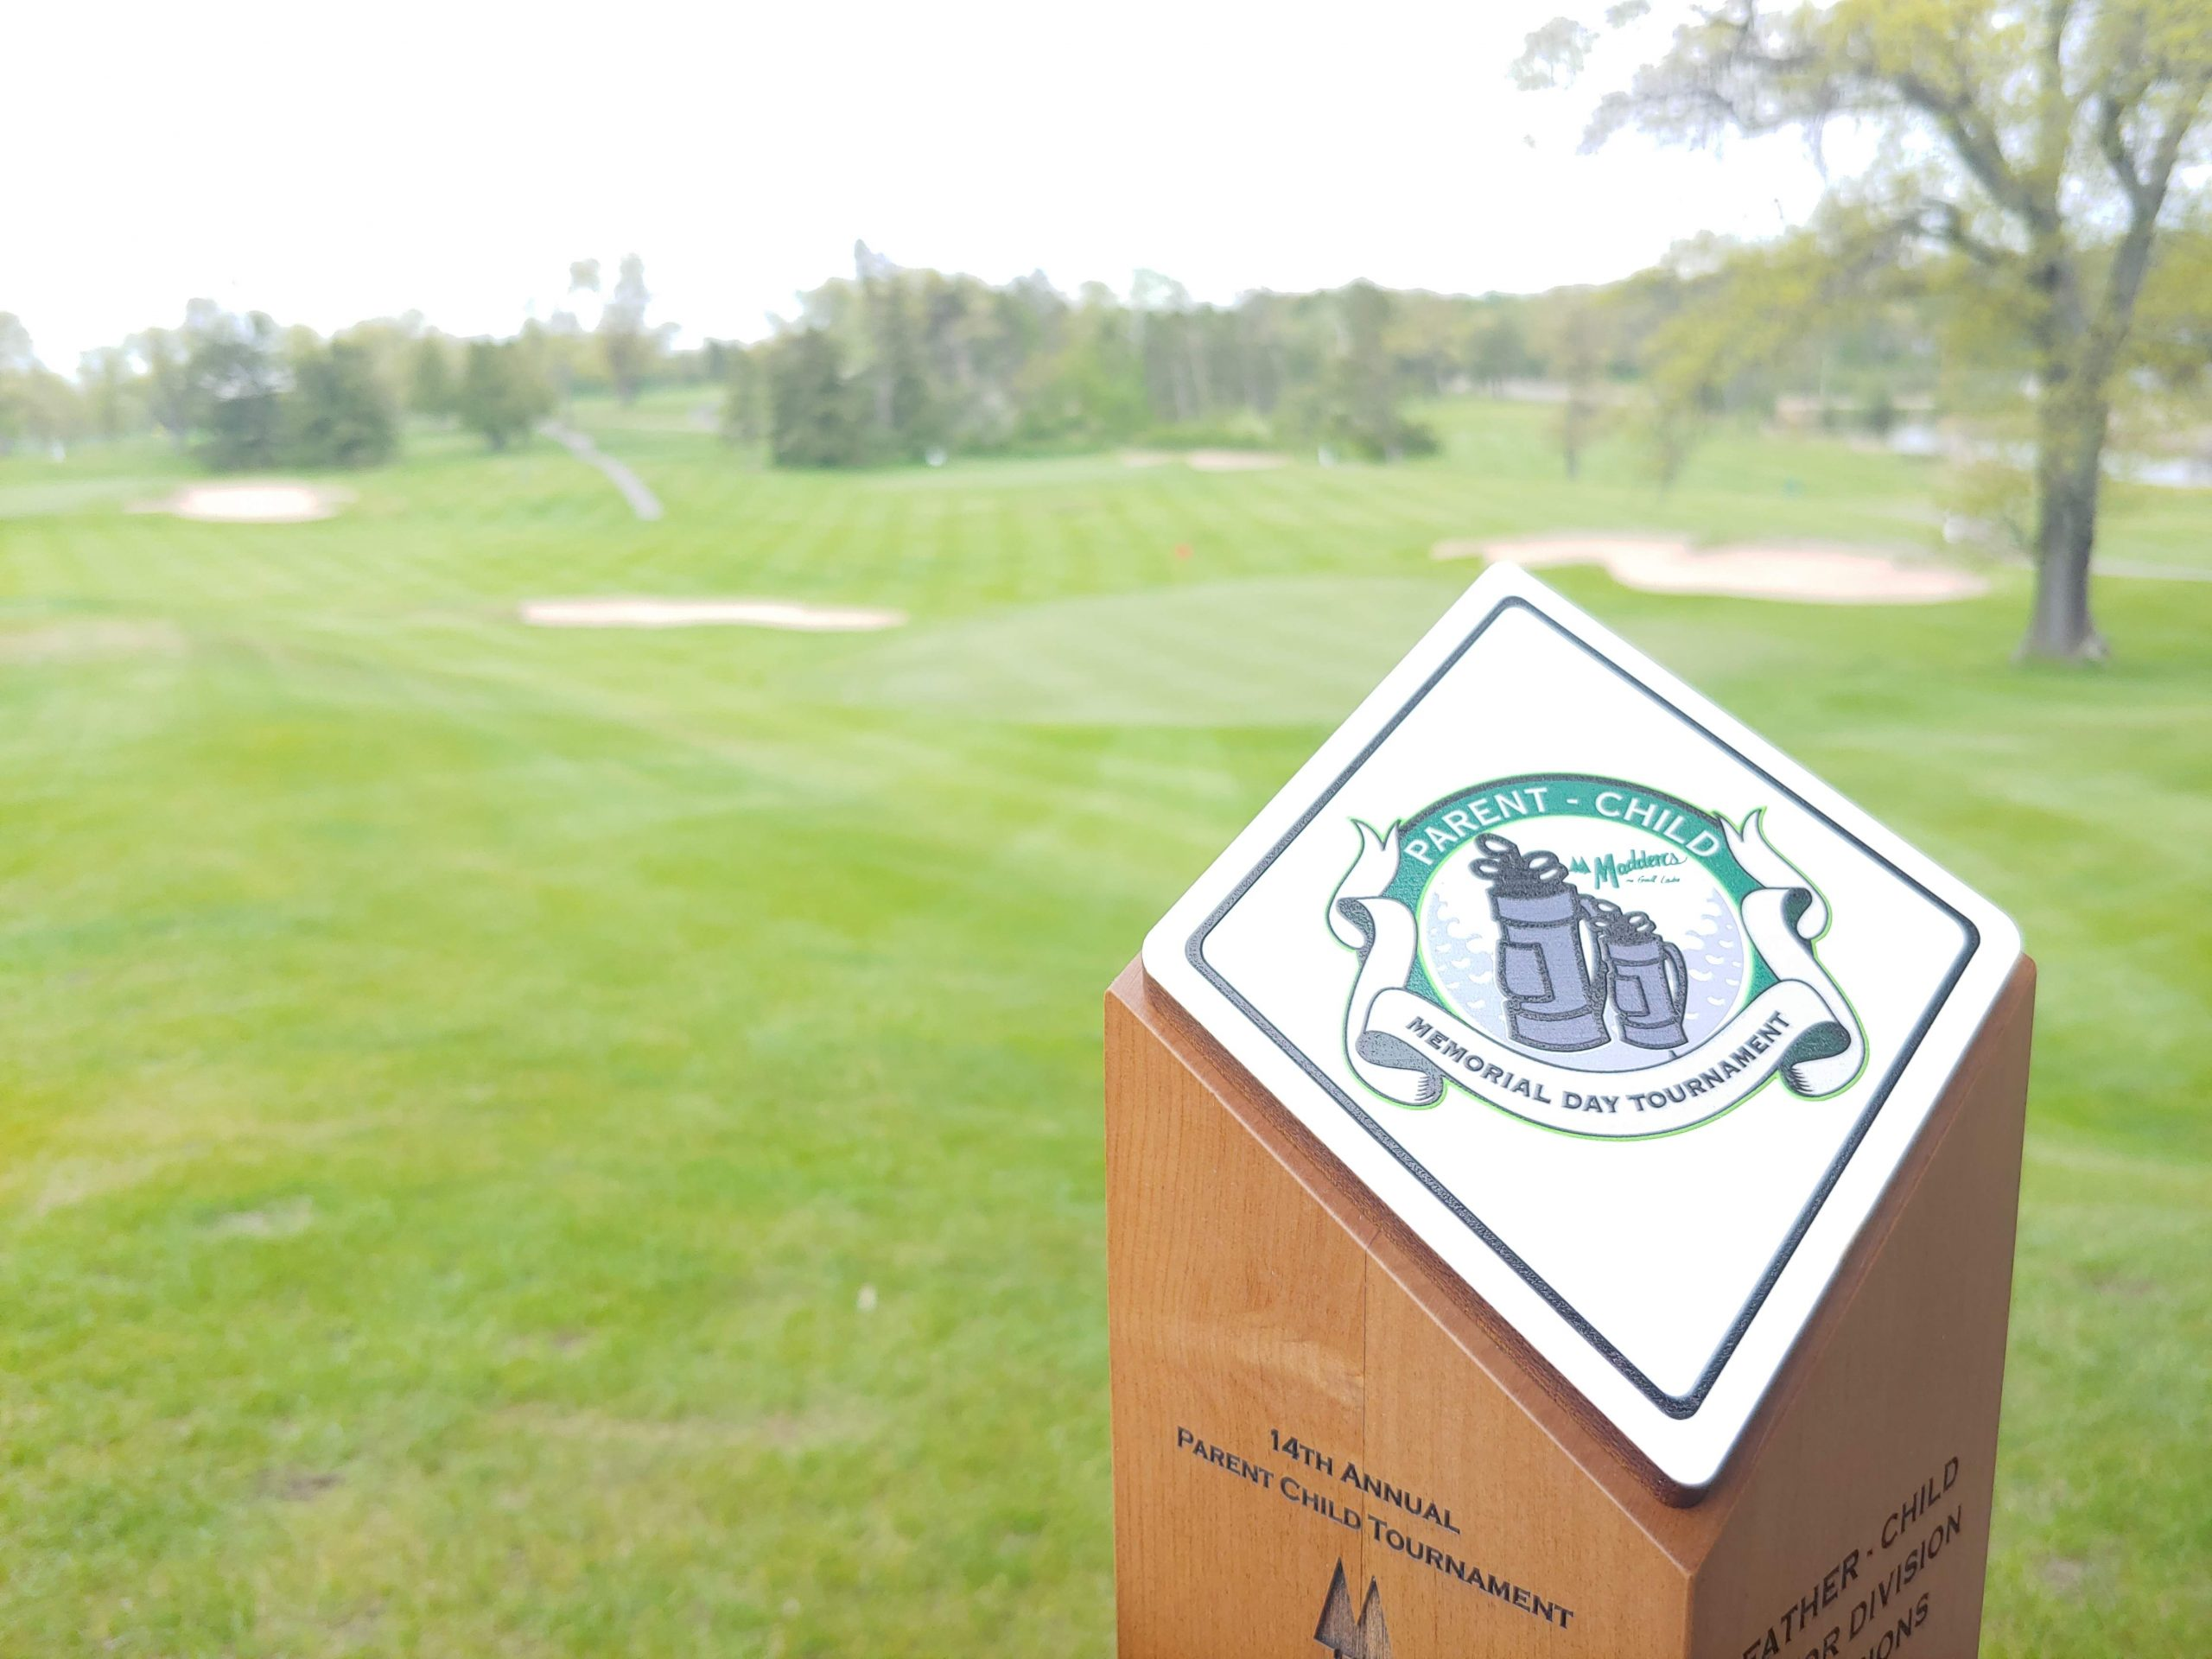 parent child memorial day tournament award on golf course